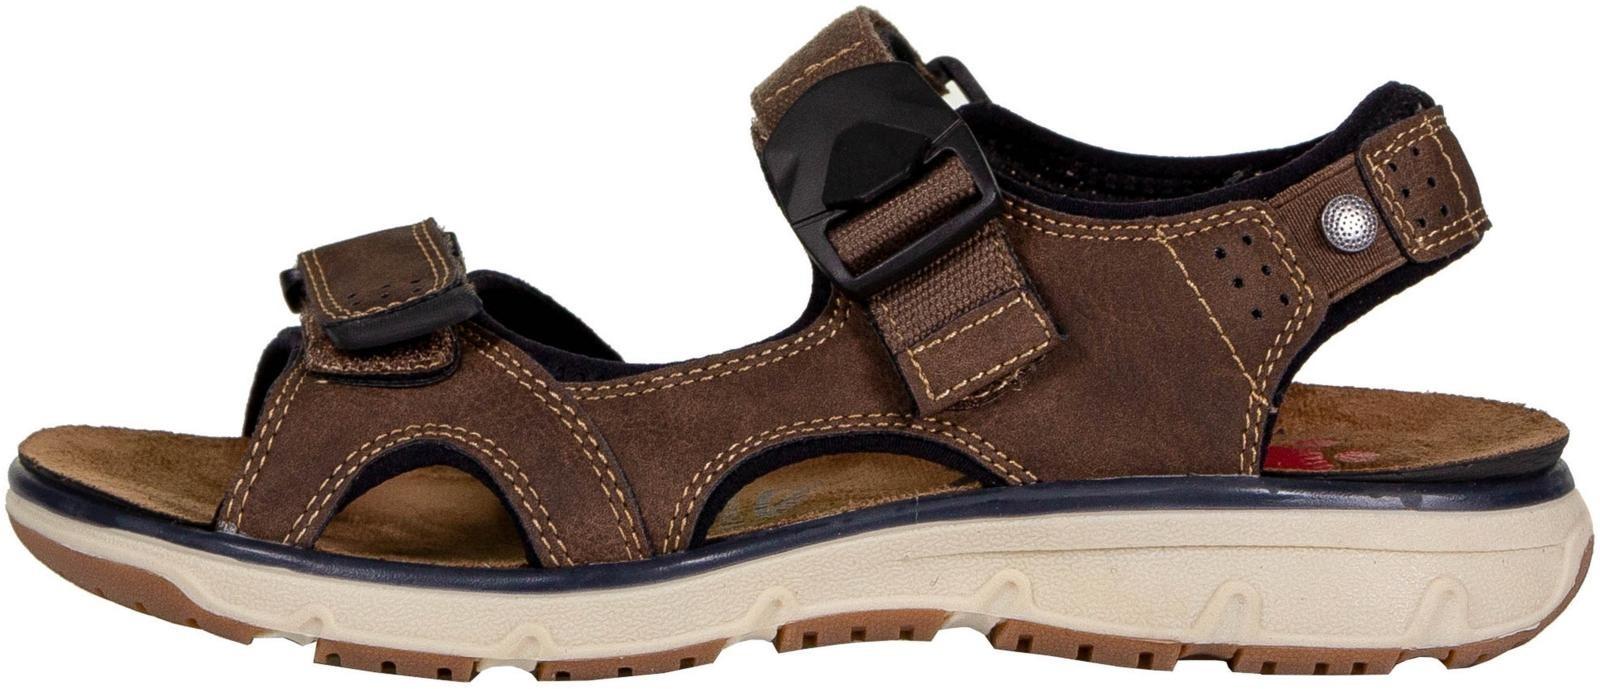 Relife miesten sandaalit